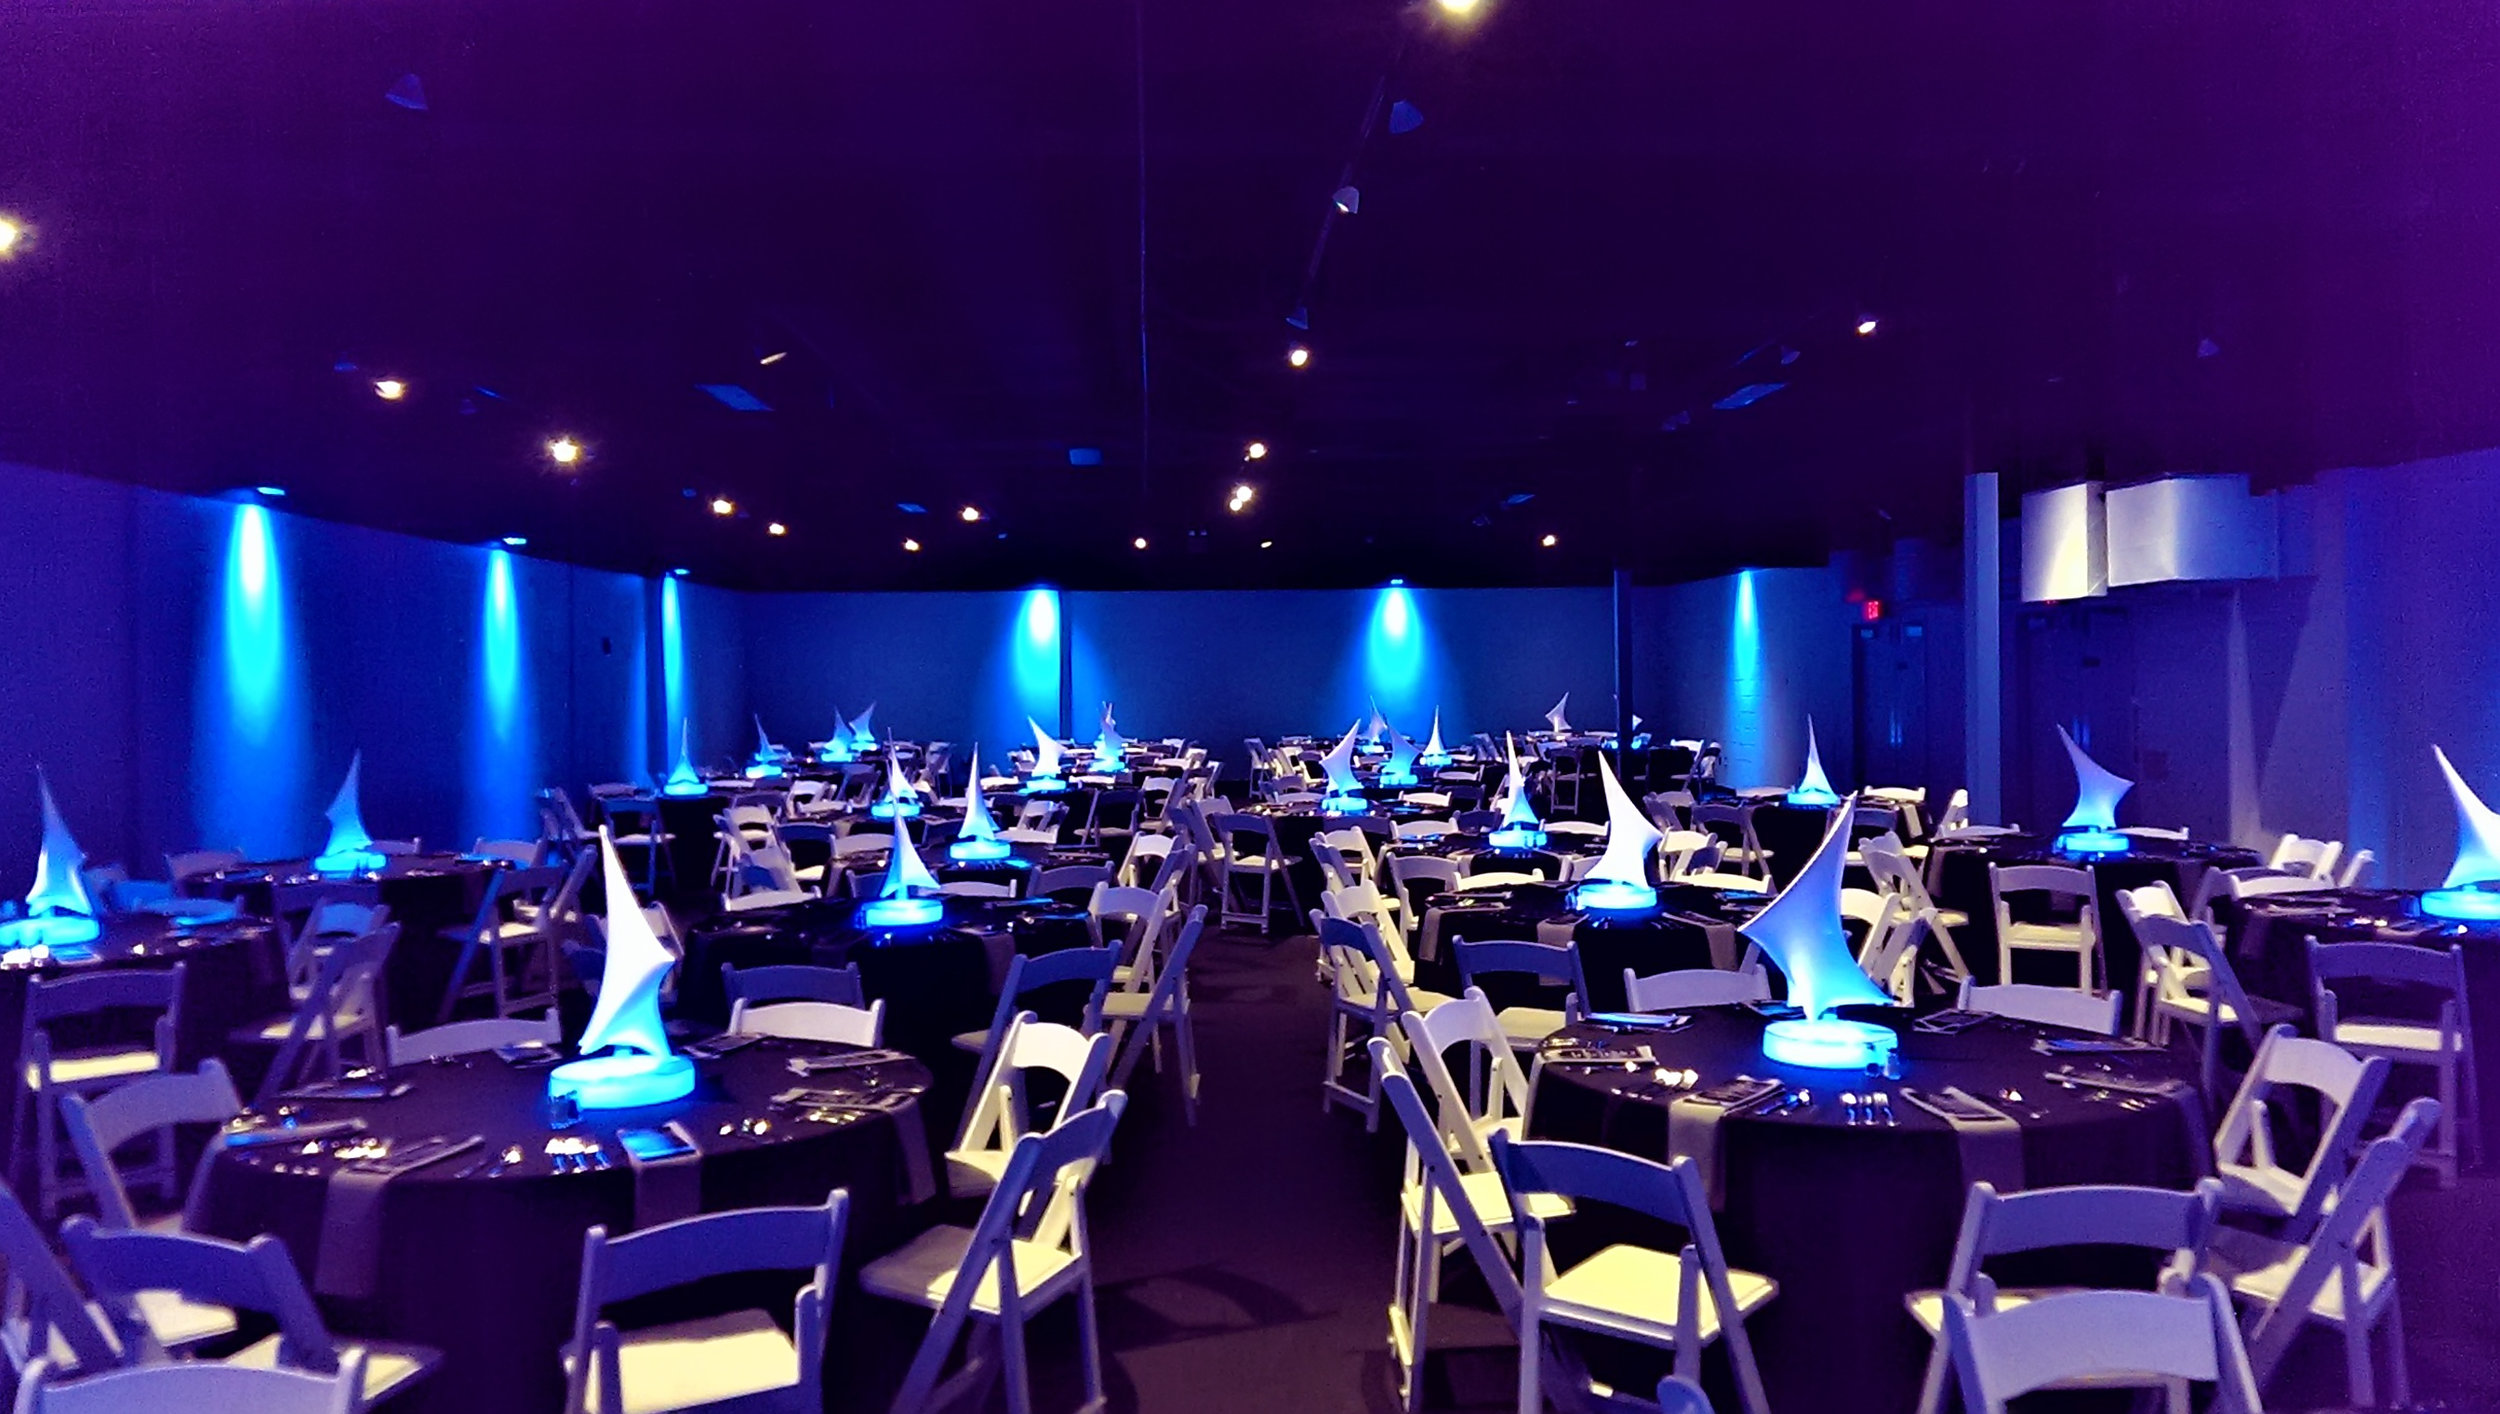 boonshoft-museum-dayton-wedding-reception-banquet-rental-elite-catering_006.jpg